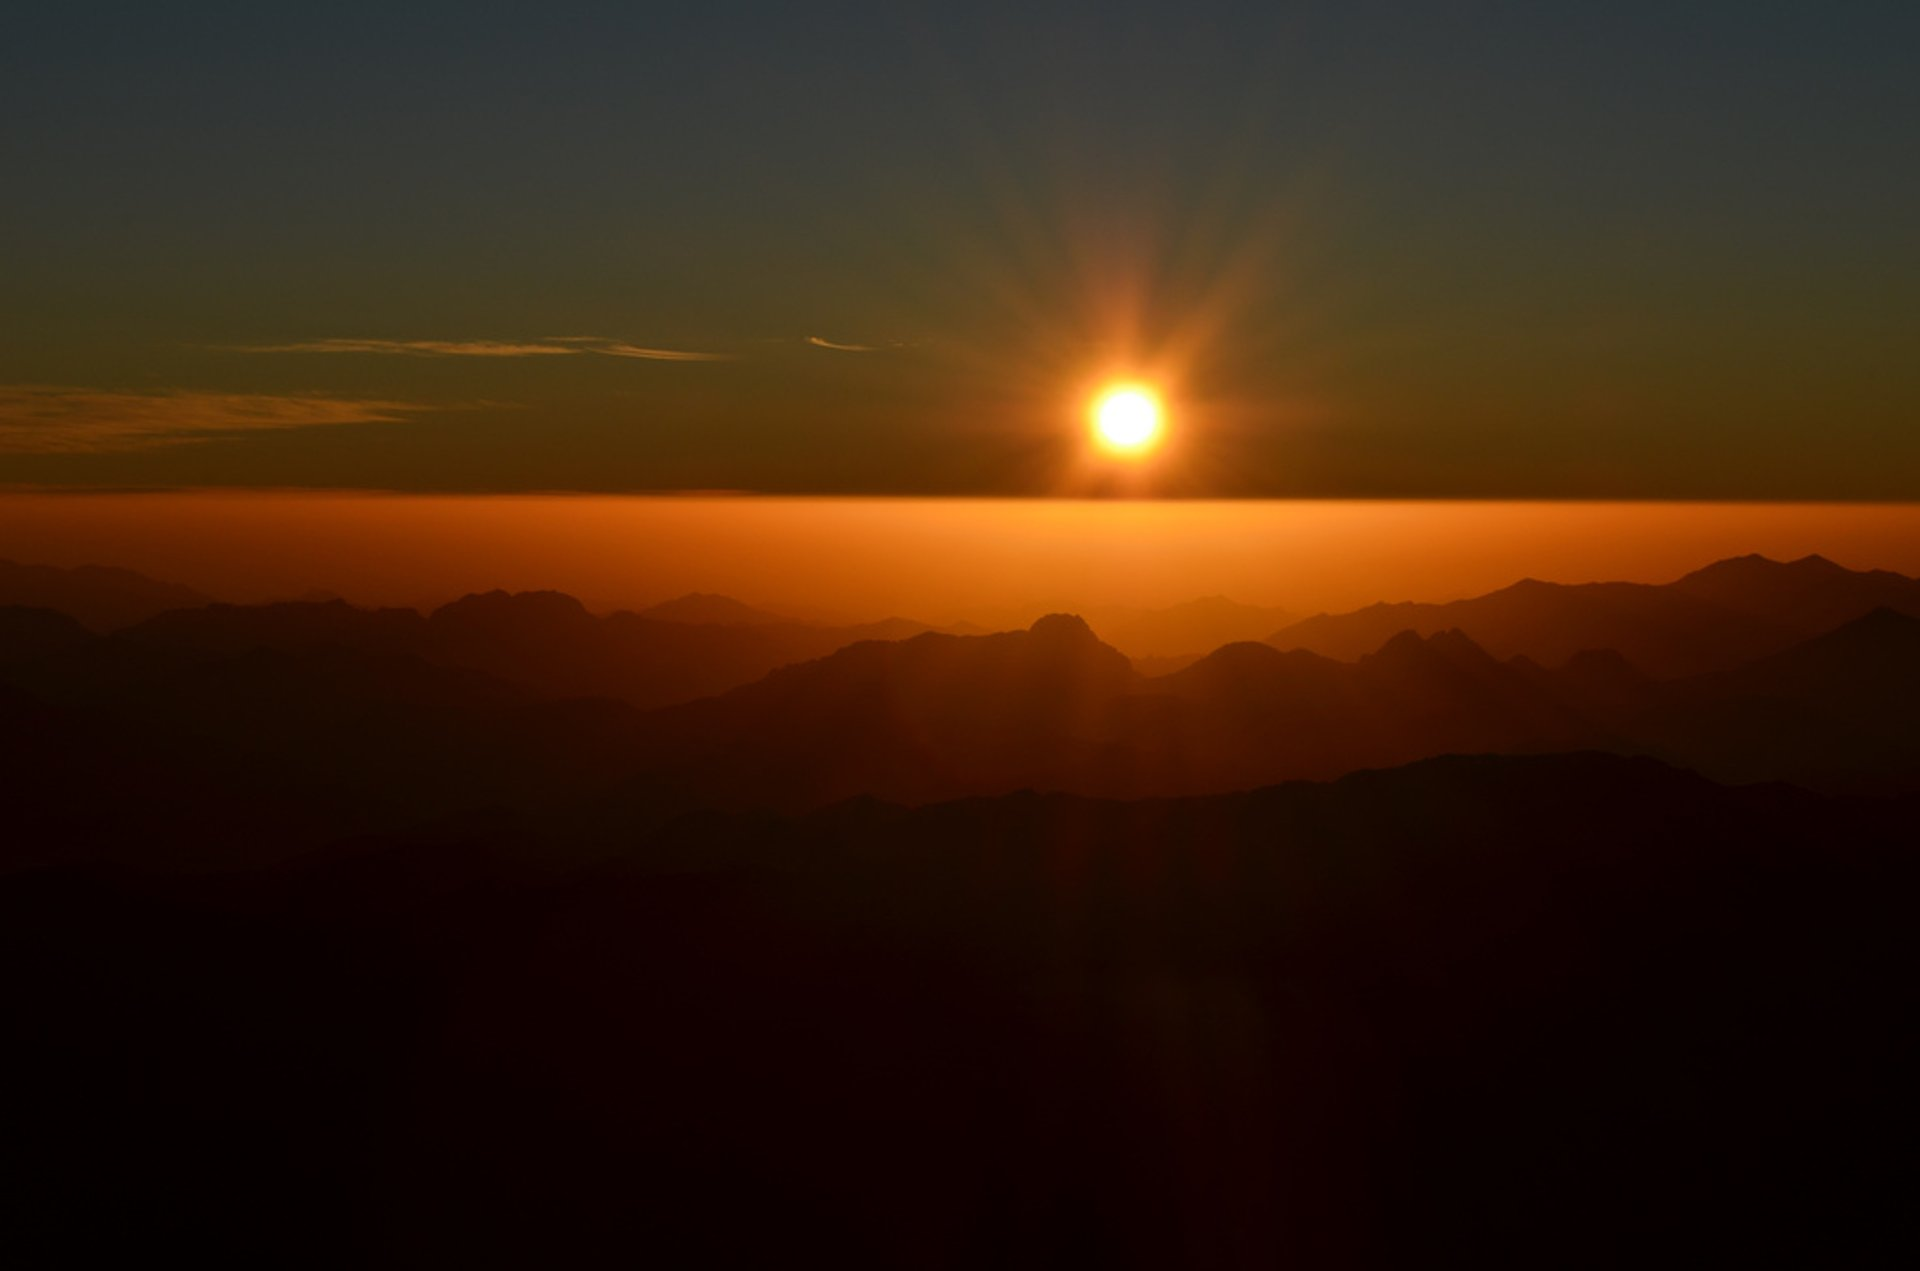 Mount Sinai, the last sunrise of 2012 2019